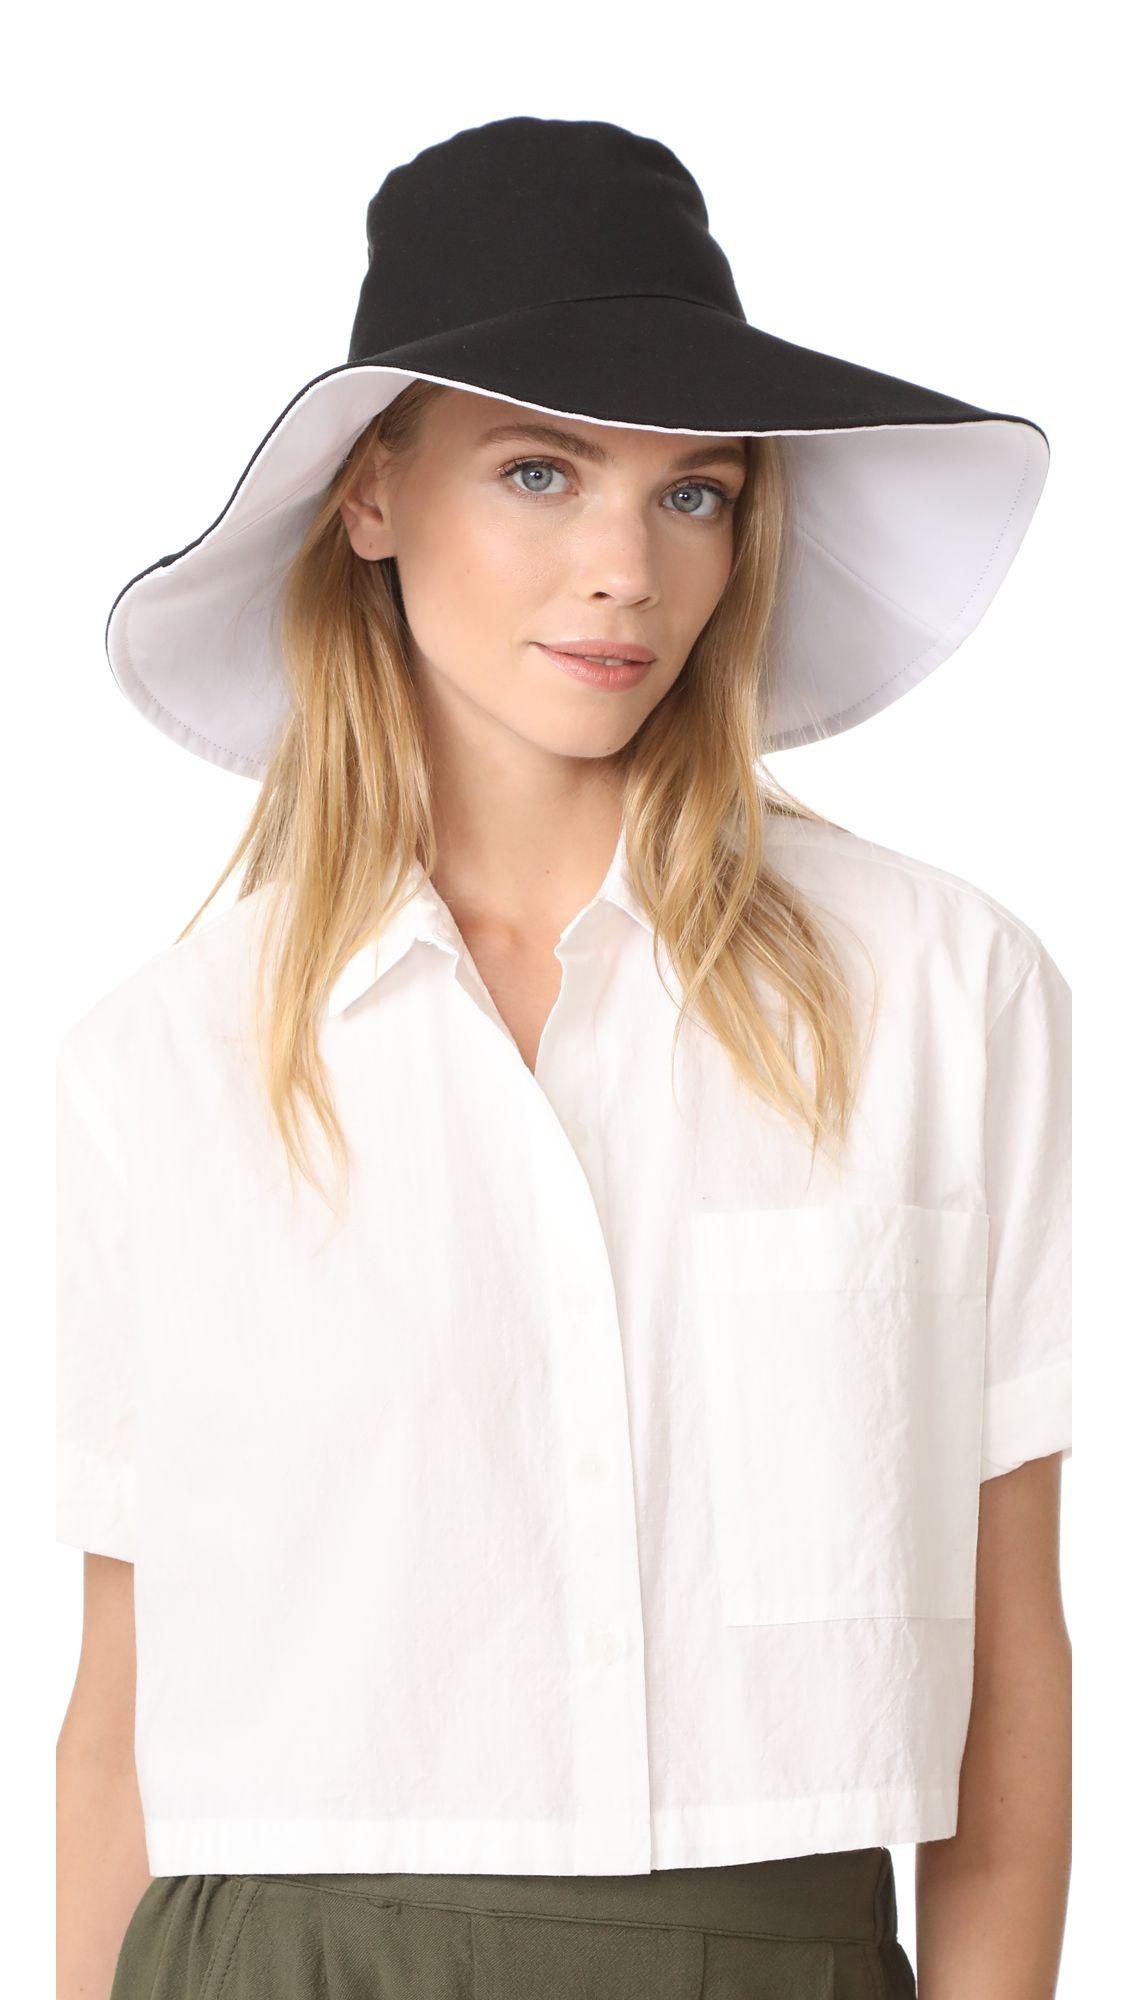 Hat Attack Canvas Reversible Sun Hat Fashion 50s Fashion Casual Sun Hats For Women